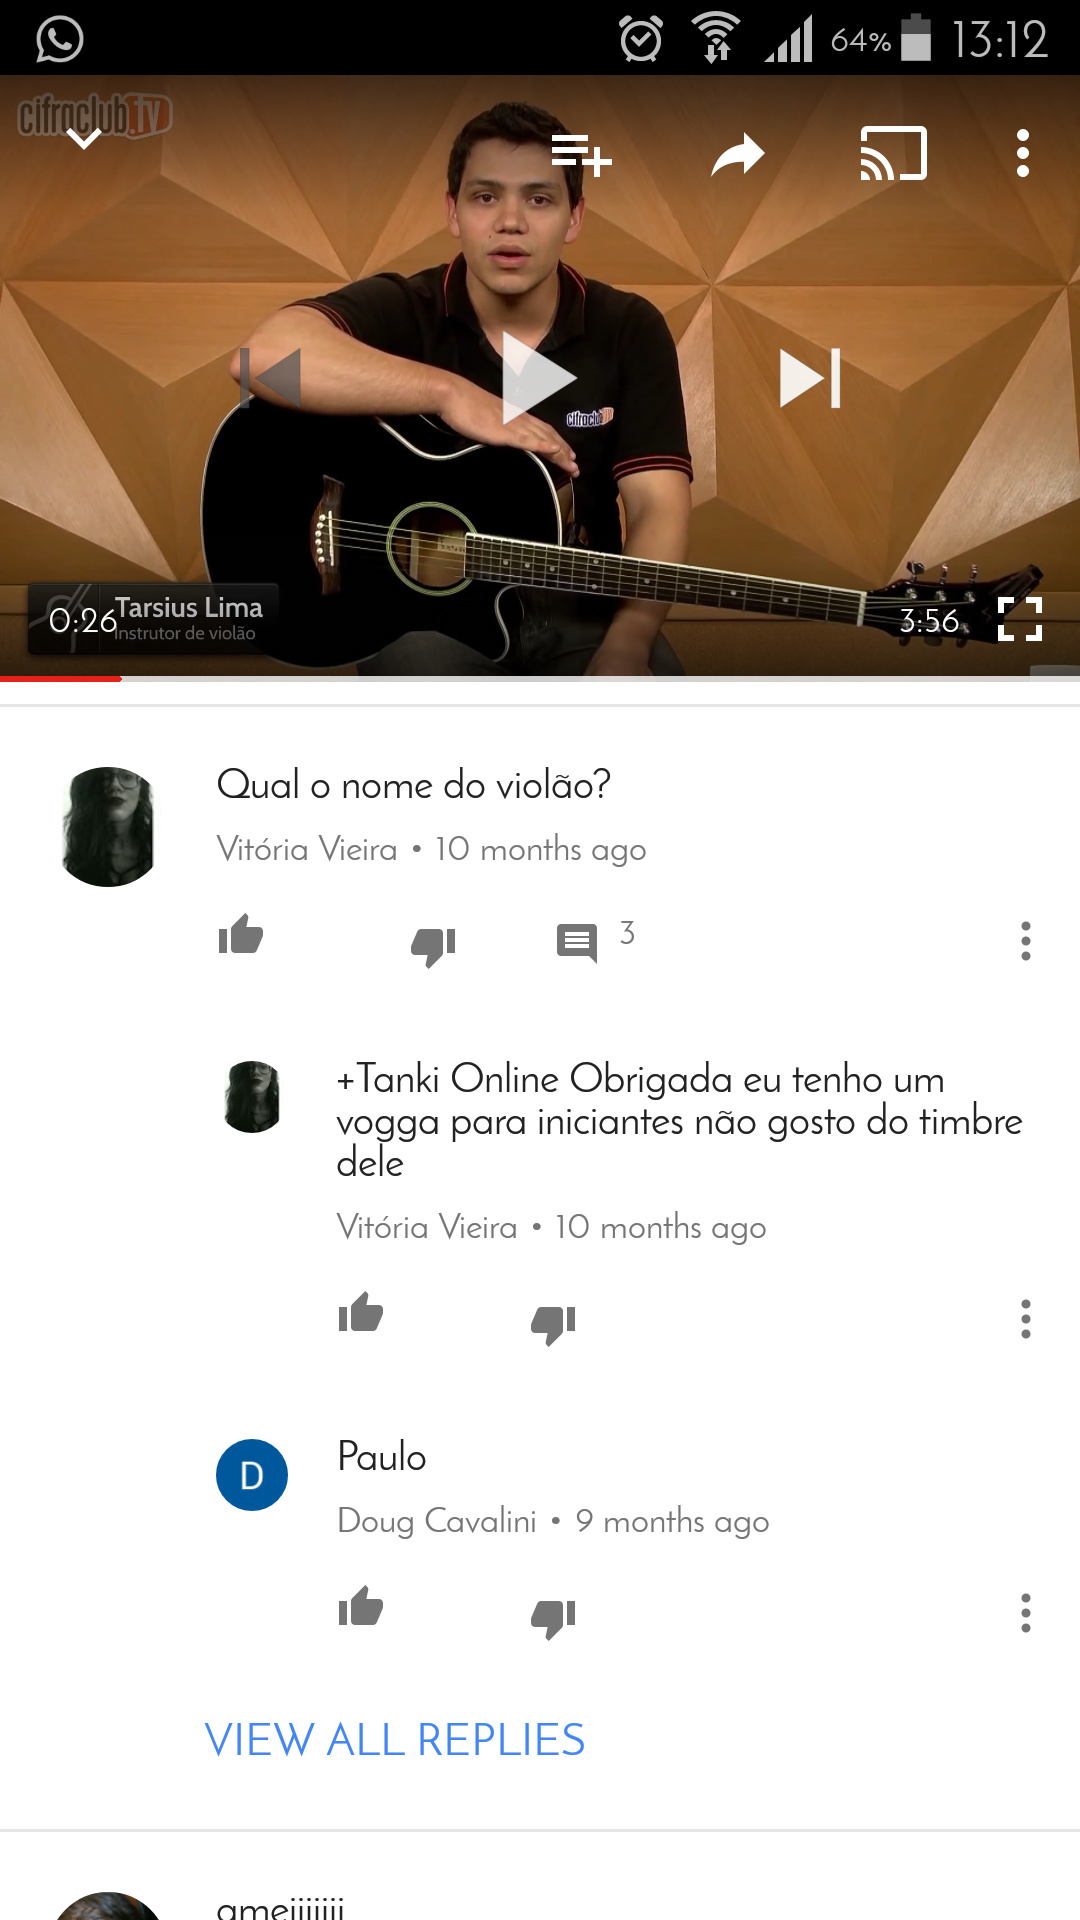 Paulo - meme